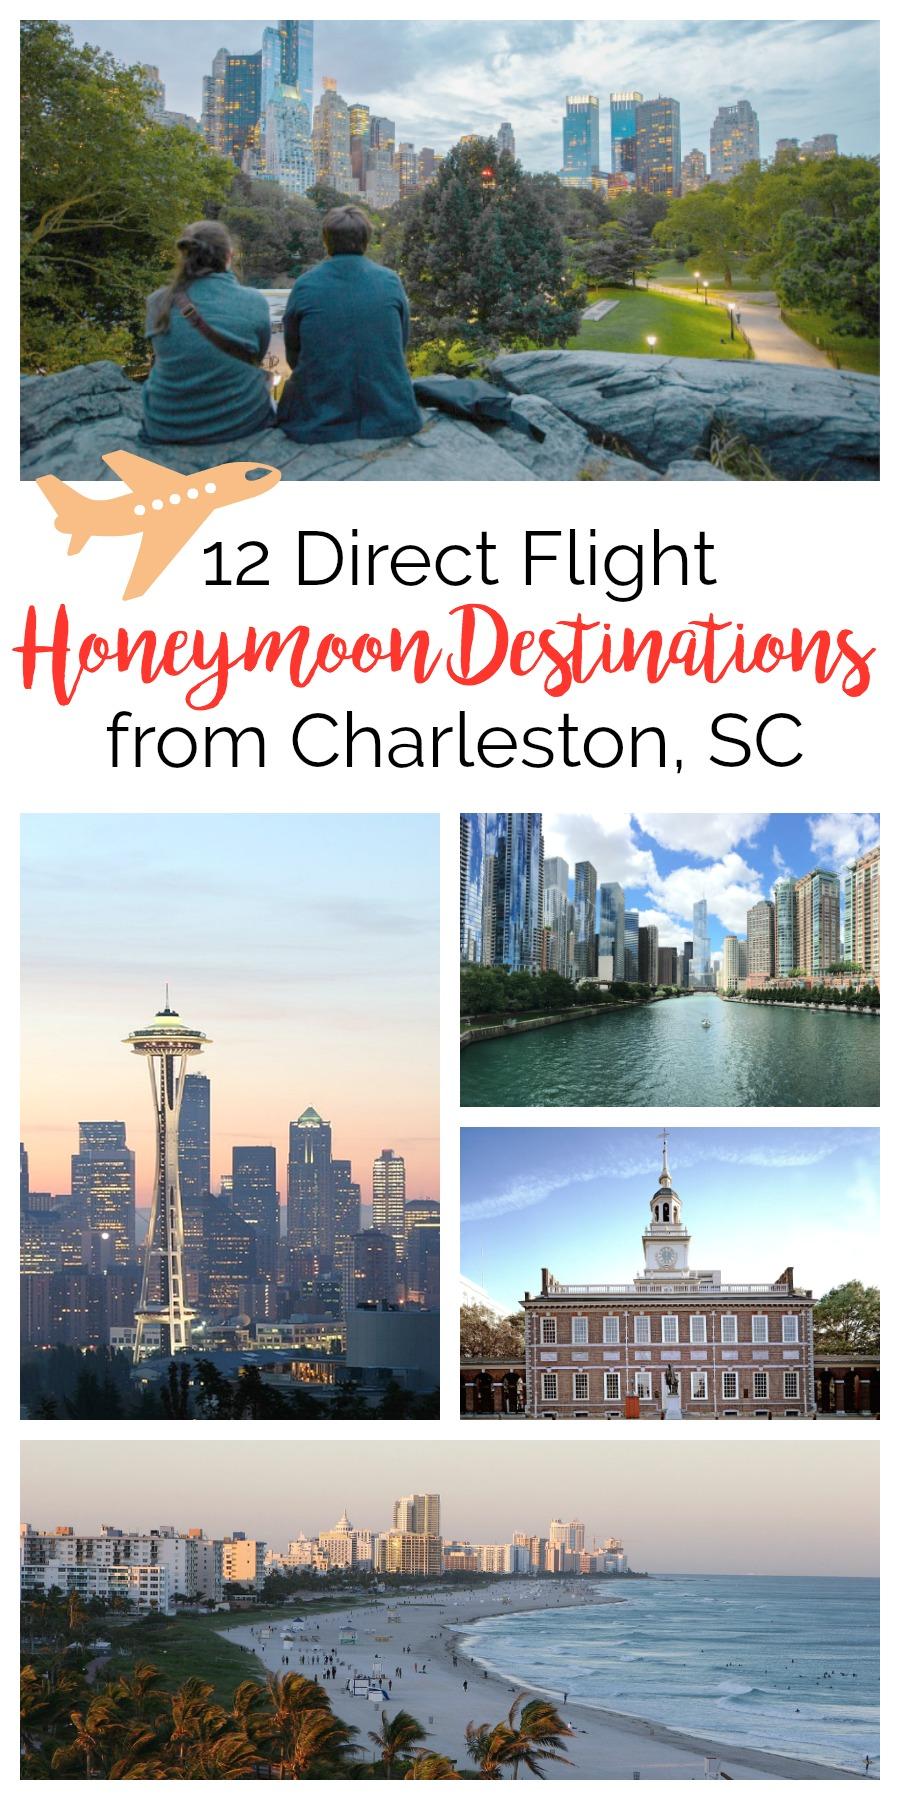 12 Direct Flight Honeymoon Destinations from Charleston, South Carolina | Palmetto State Weddings